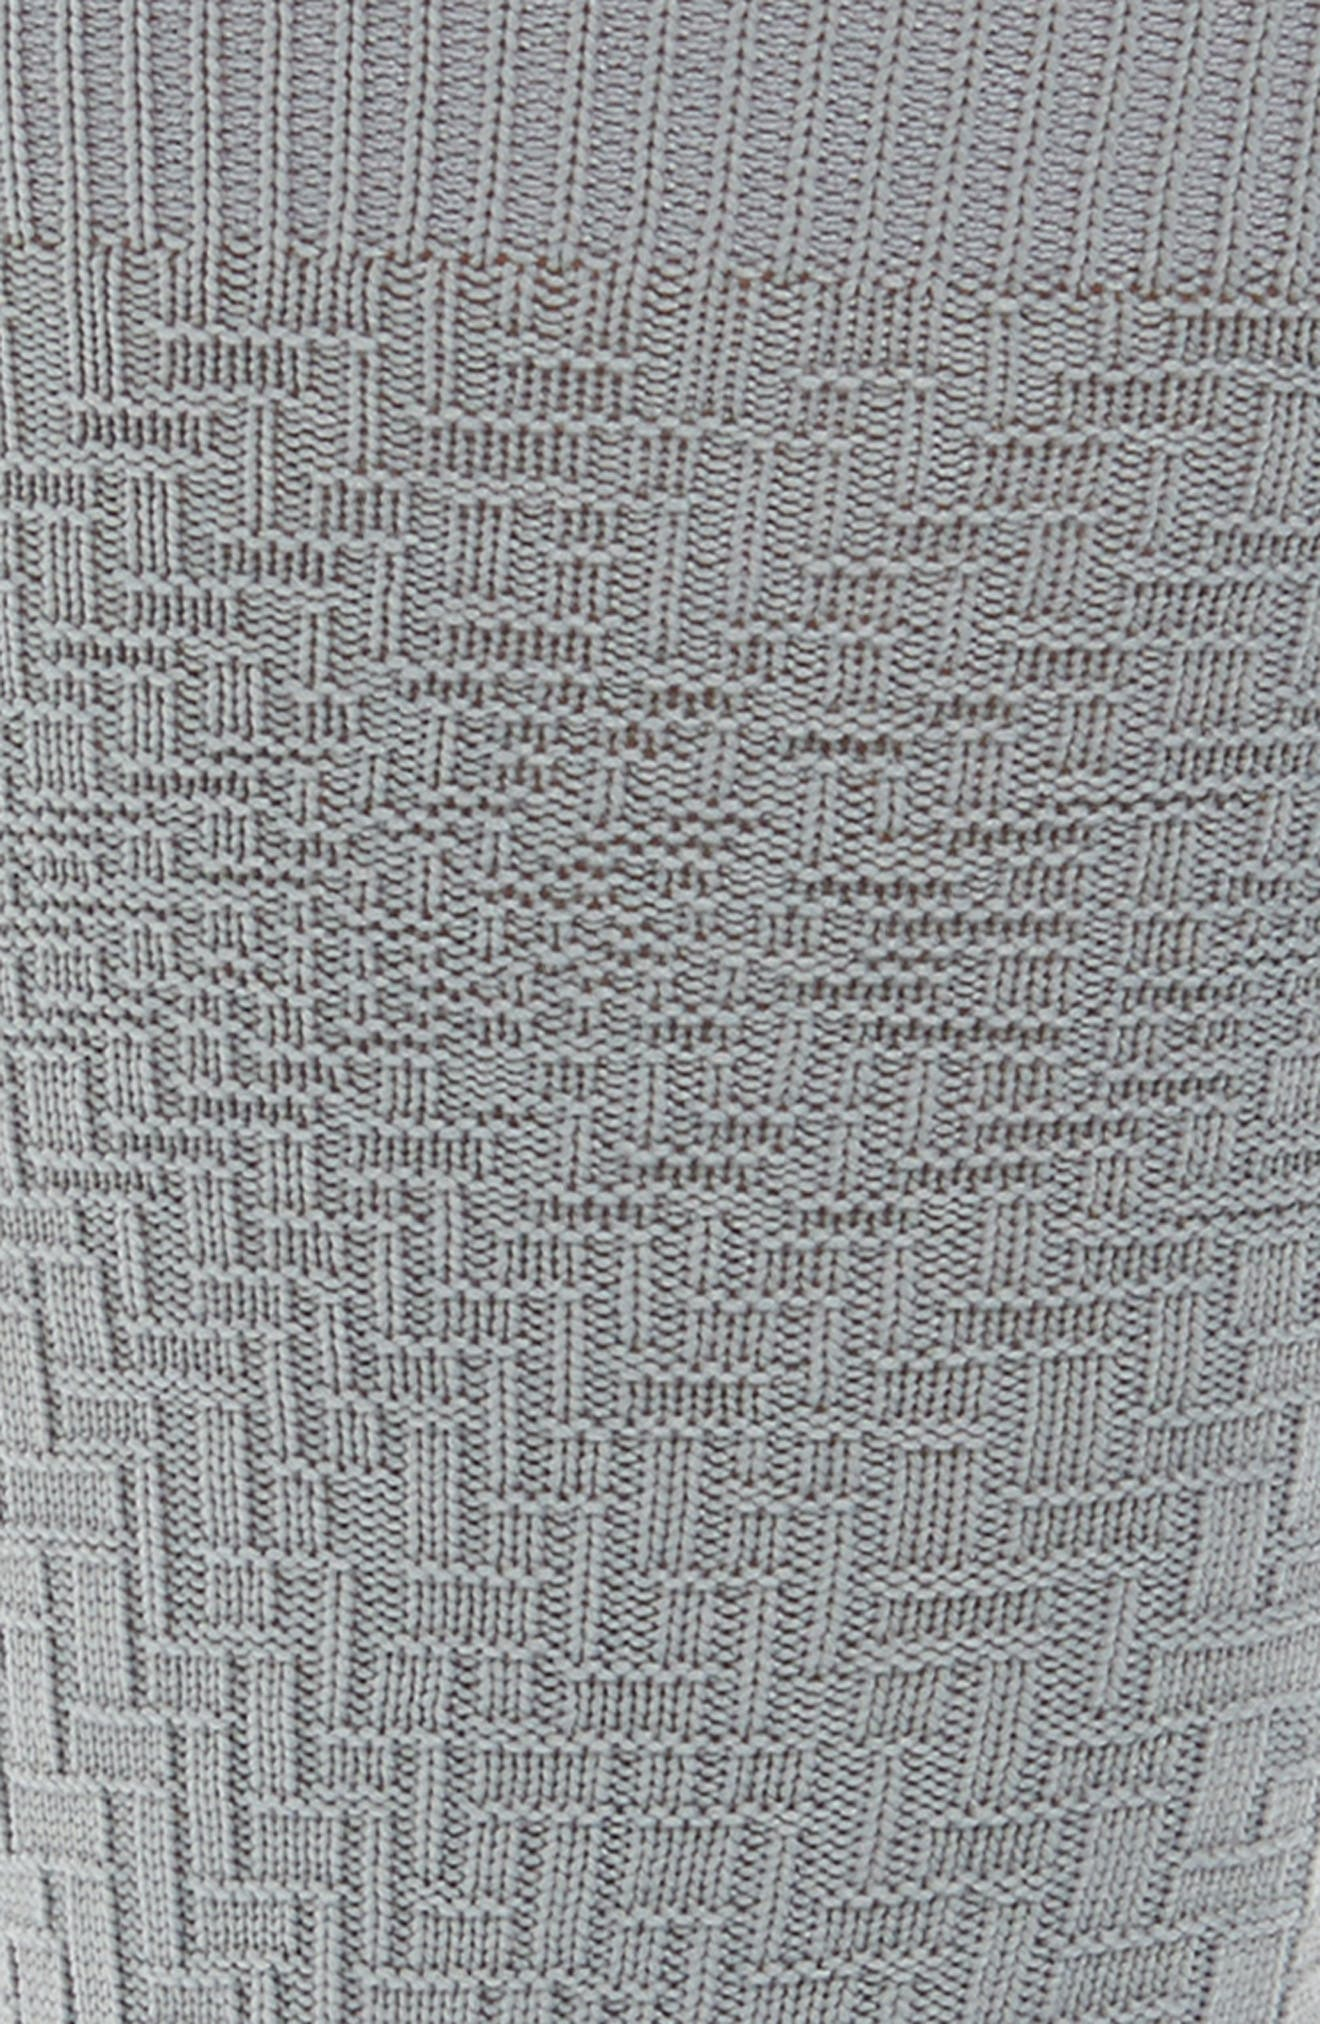 Alternate Image 2  - Cole Haan Distorted Texture Crew Socks (3 for $30)